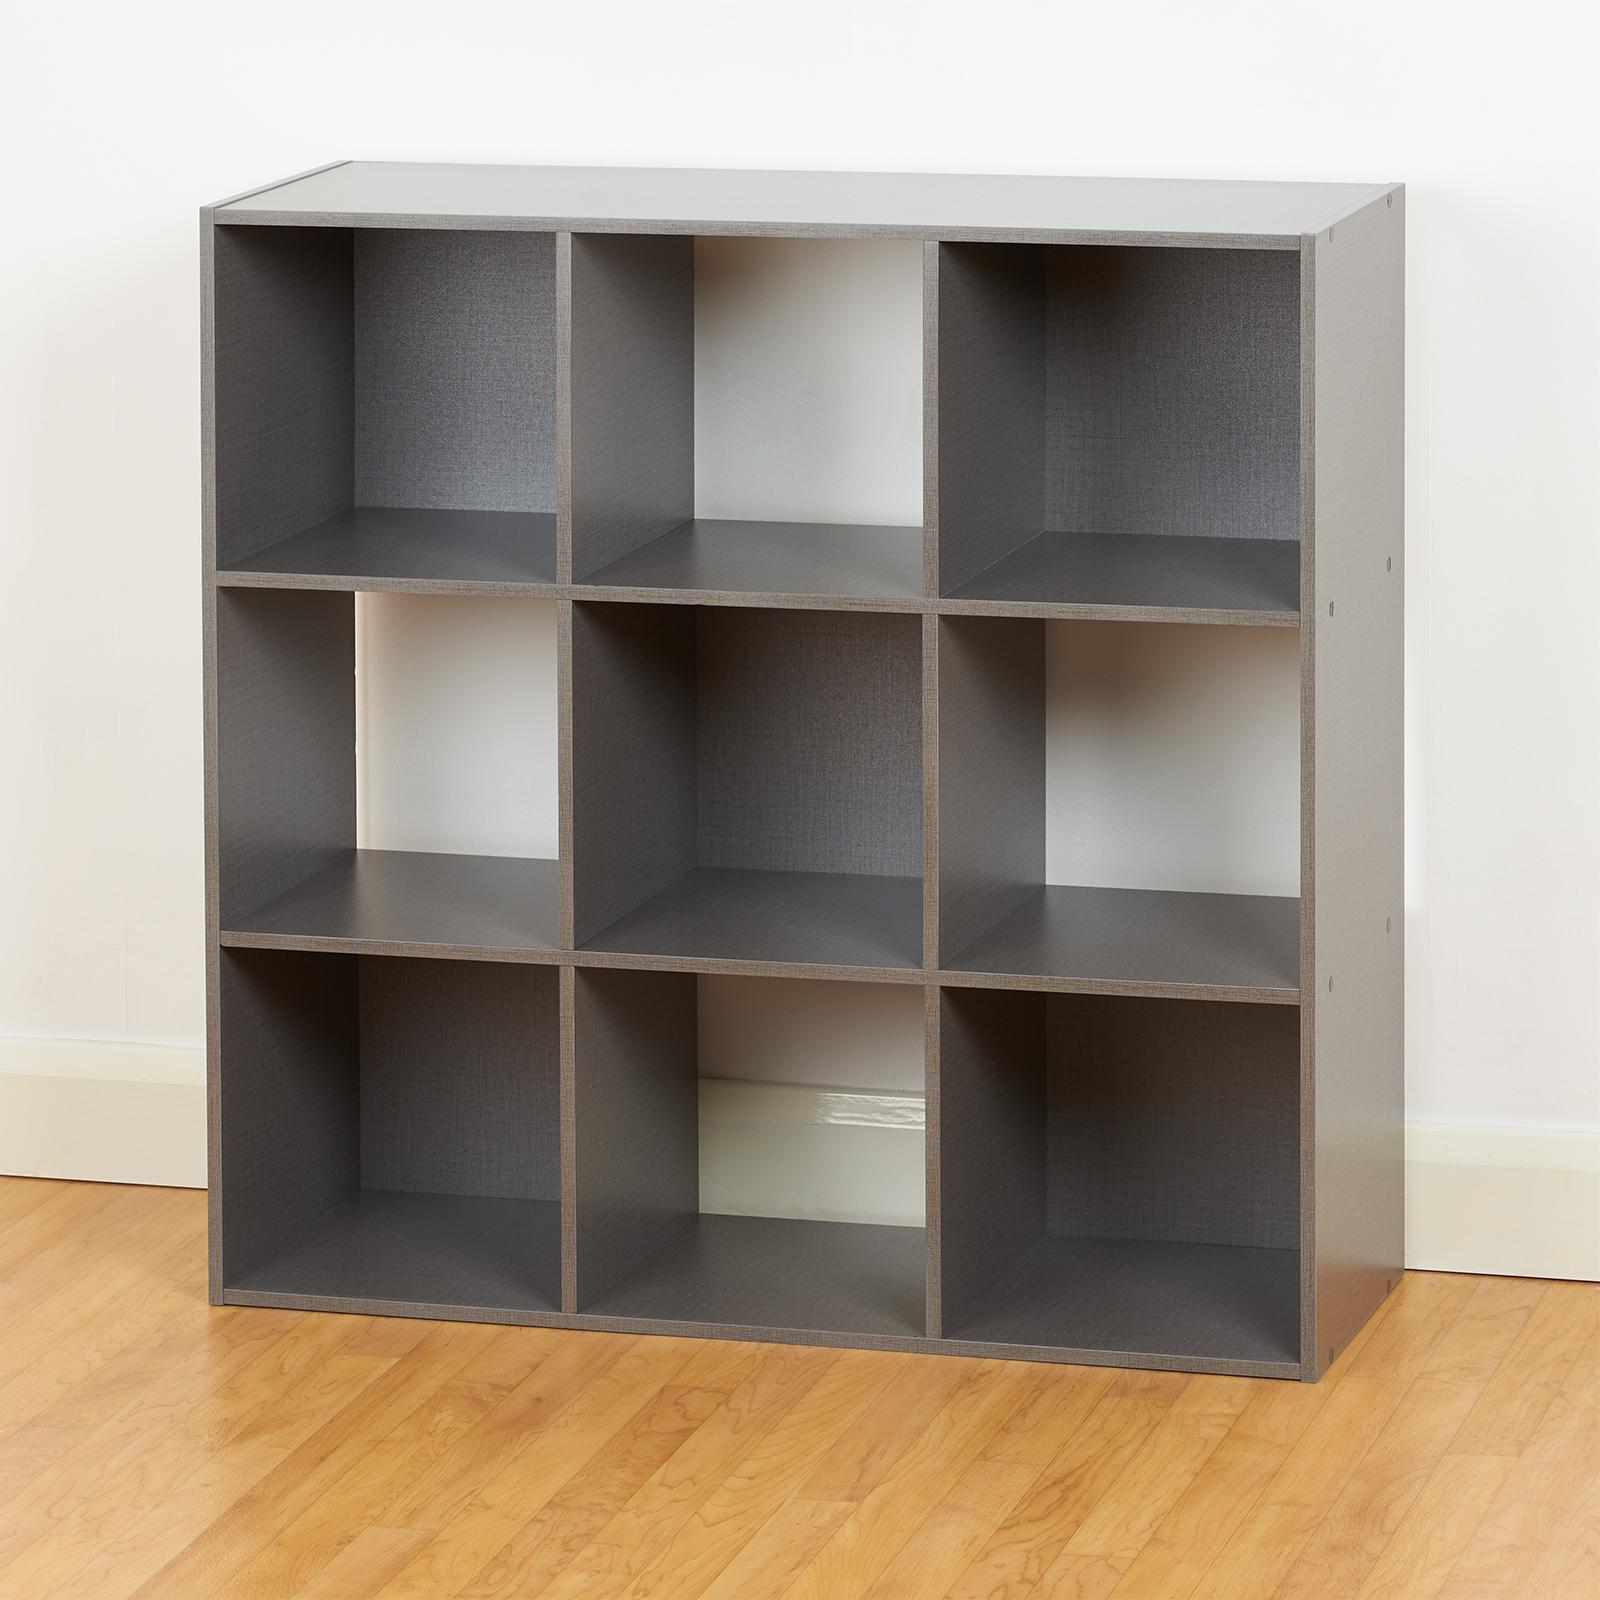 Kids Storage Cube Organizer Toy Box Kids Bedroom Furniture: Grey 9 Cube Storage Unit Cabinet Childrens/Kids Bedroom